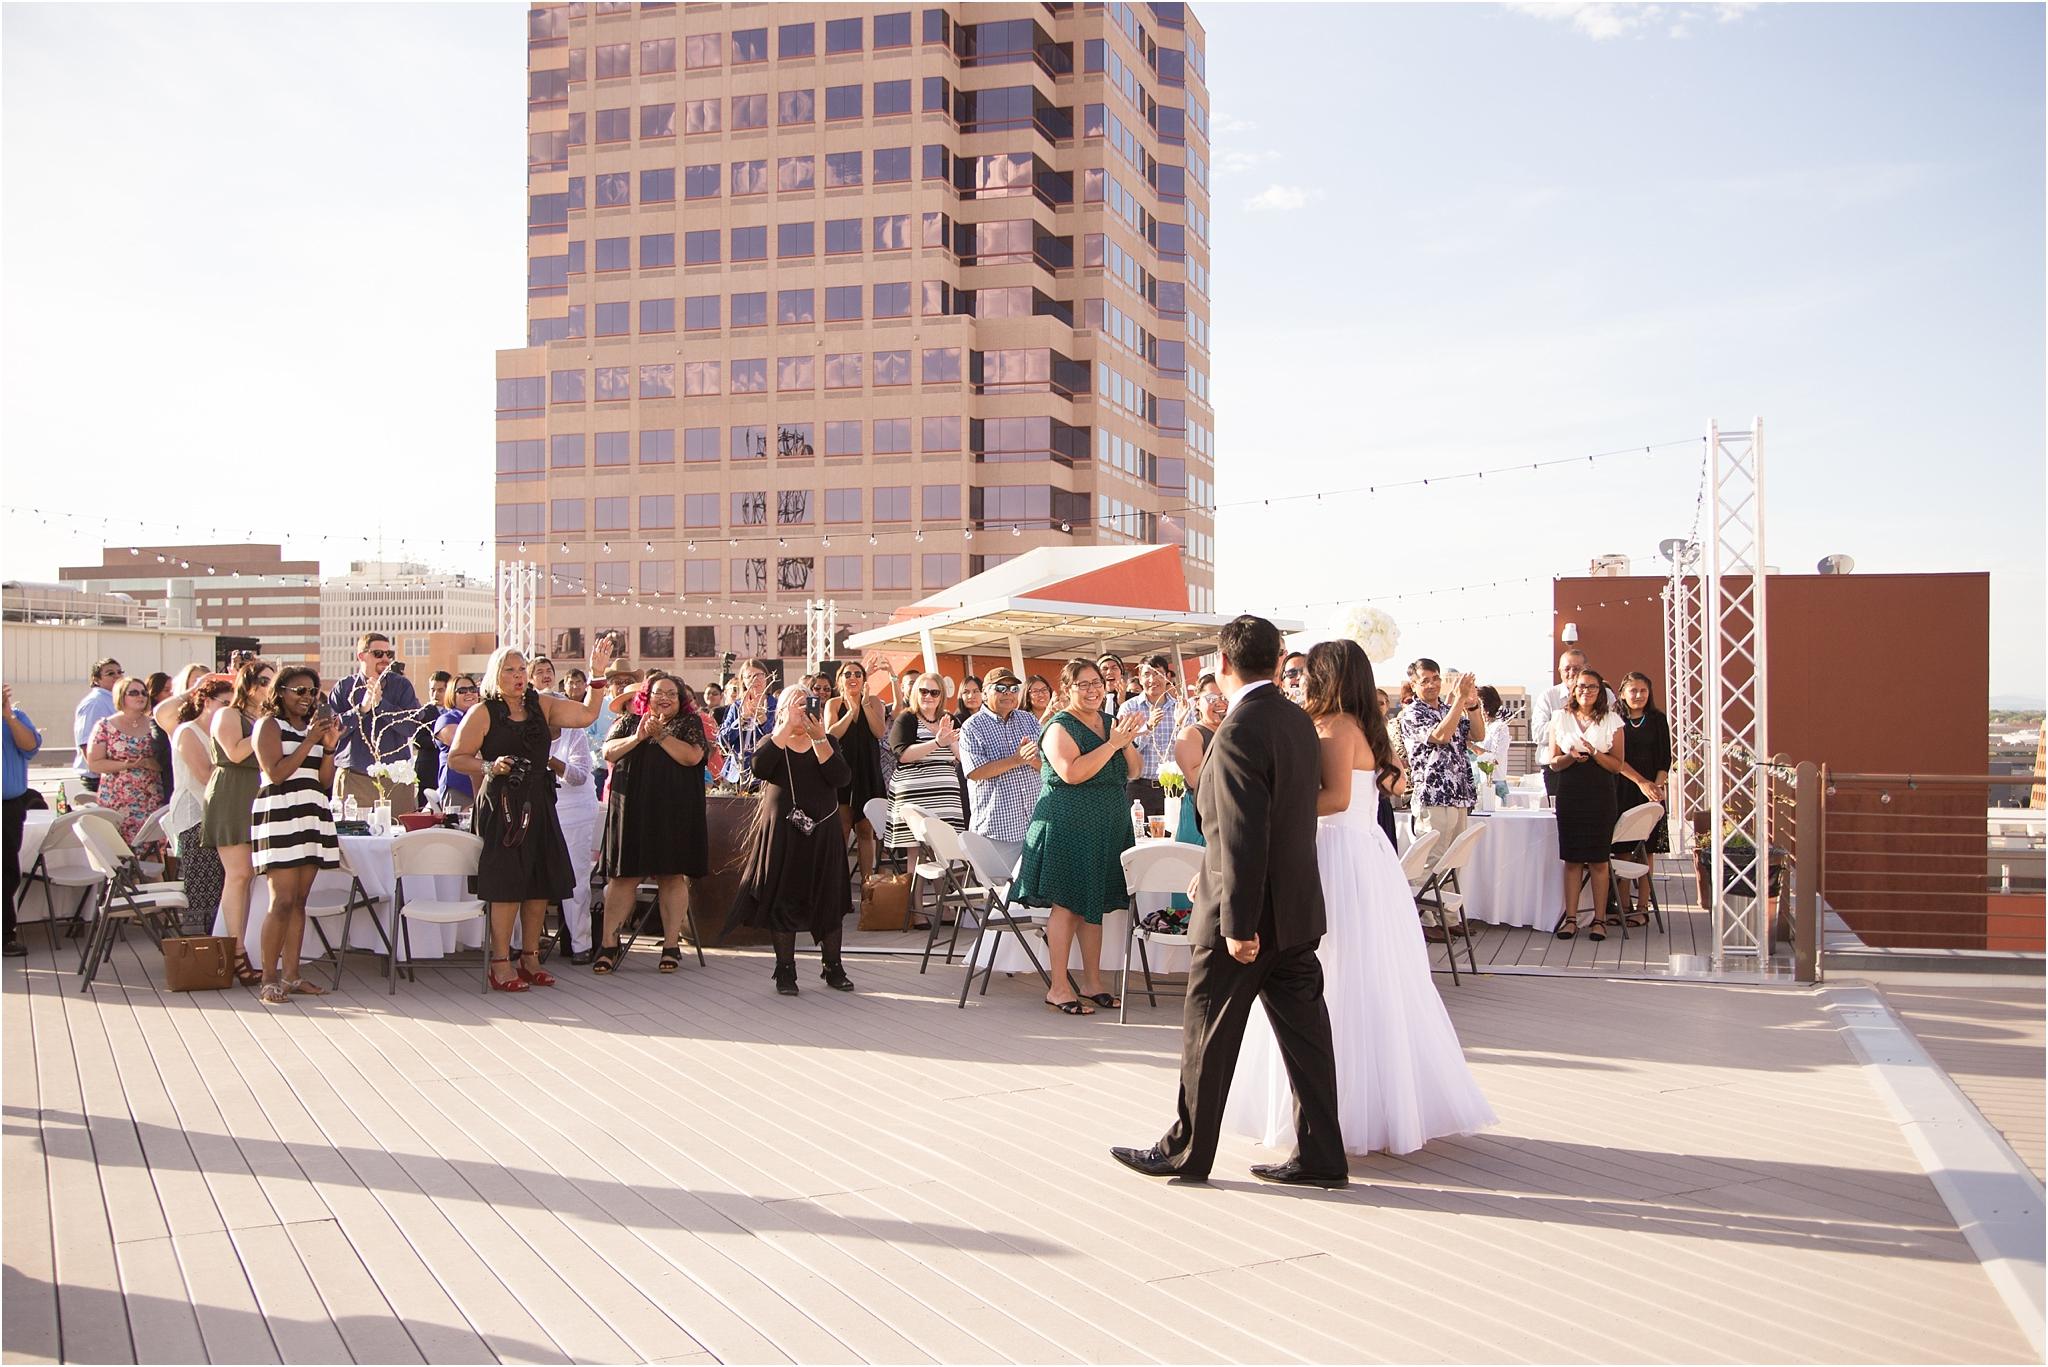 kayla kitts photography - albuquerque botanical gardens - albuquerque wedding photographer - albuquerque wedding - the banque lofts wedding_0029.jpg